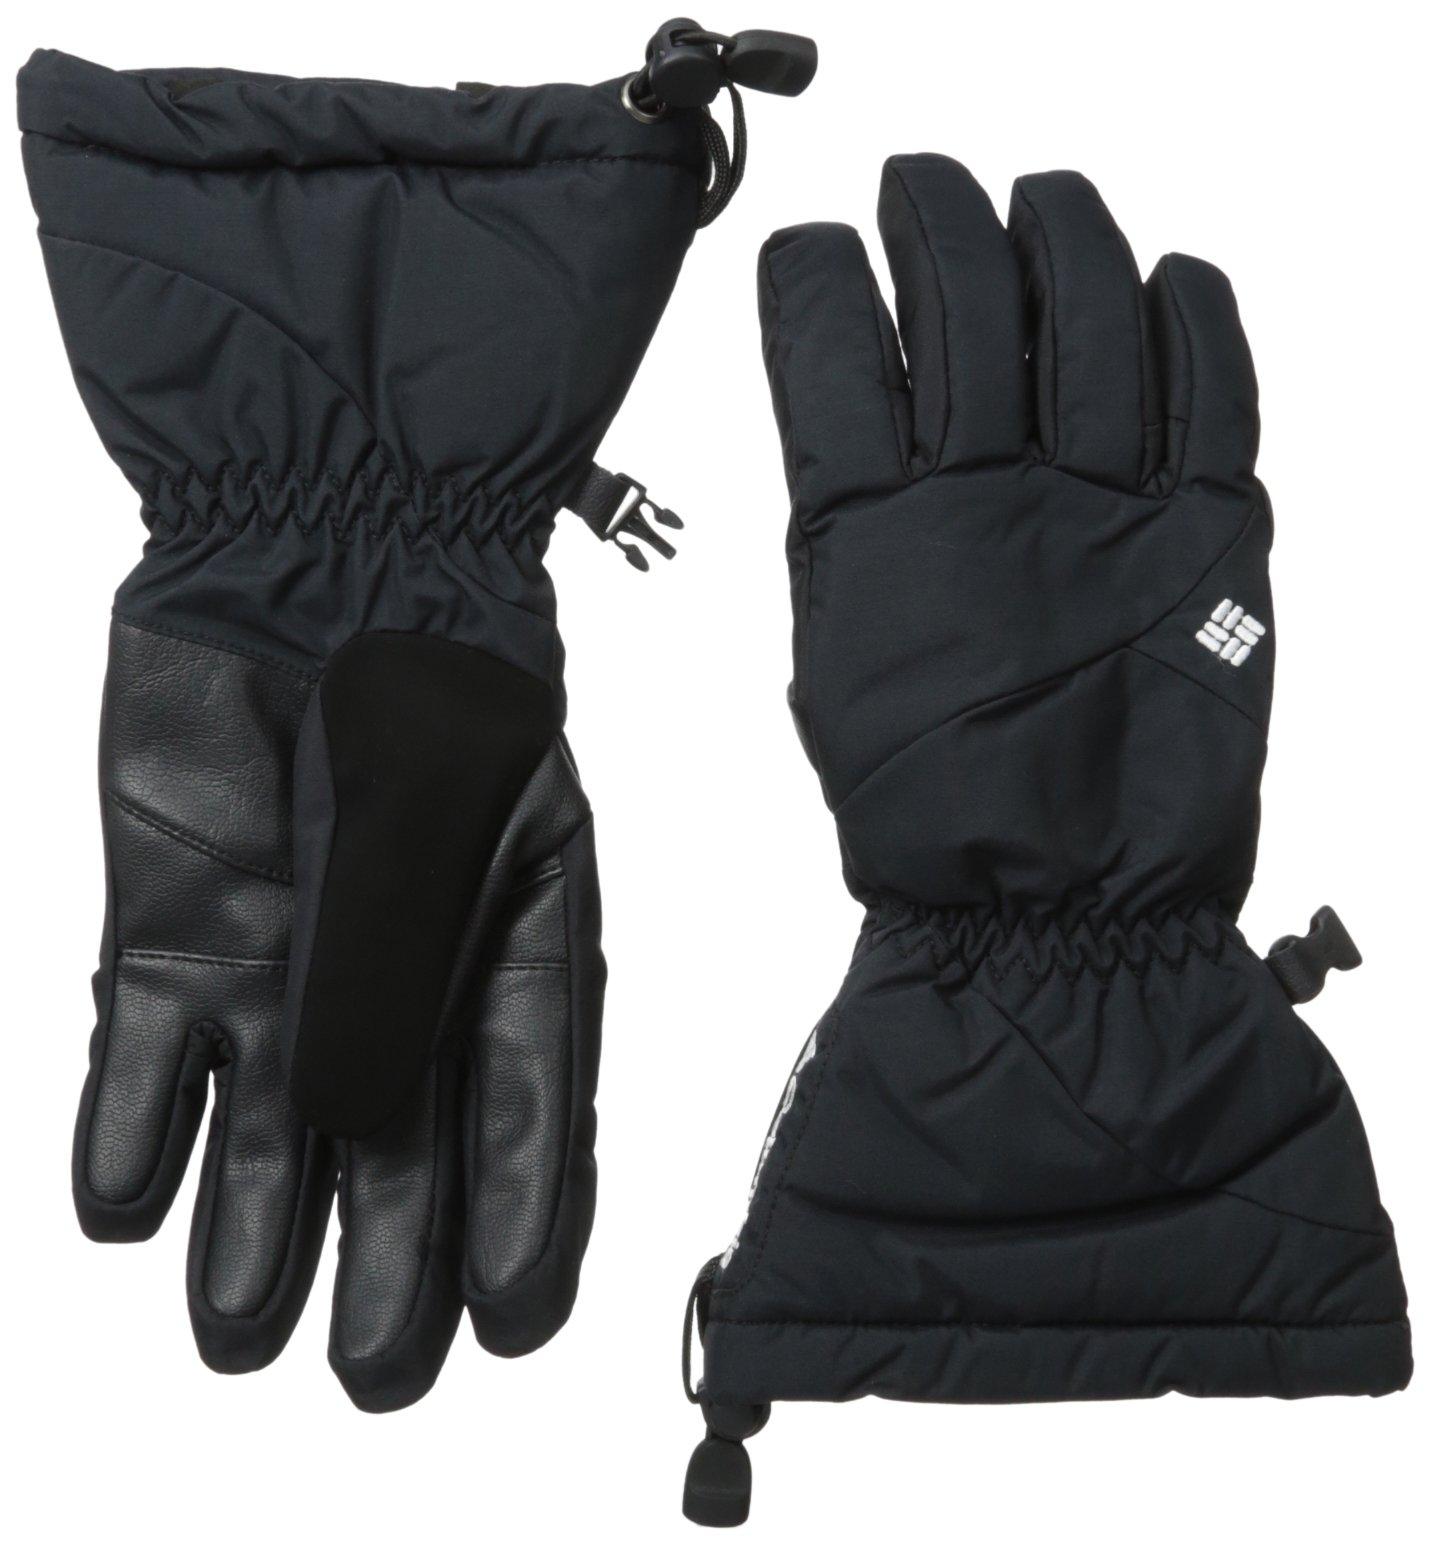 Columbia Sportswear Women's Tumalo Mountain Gloves, Black, Large